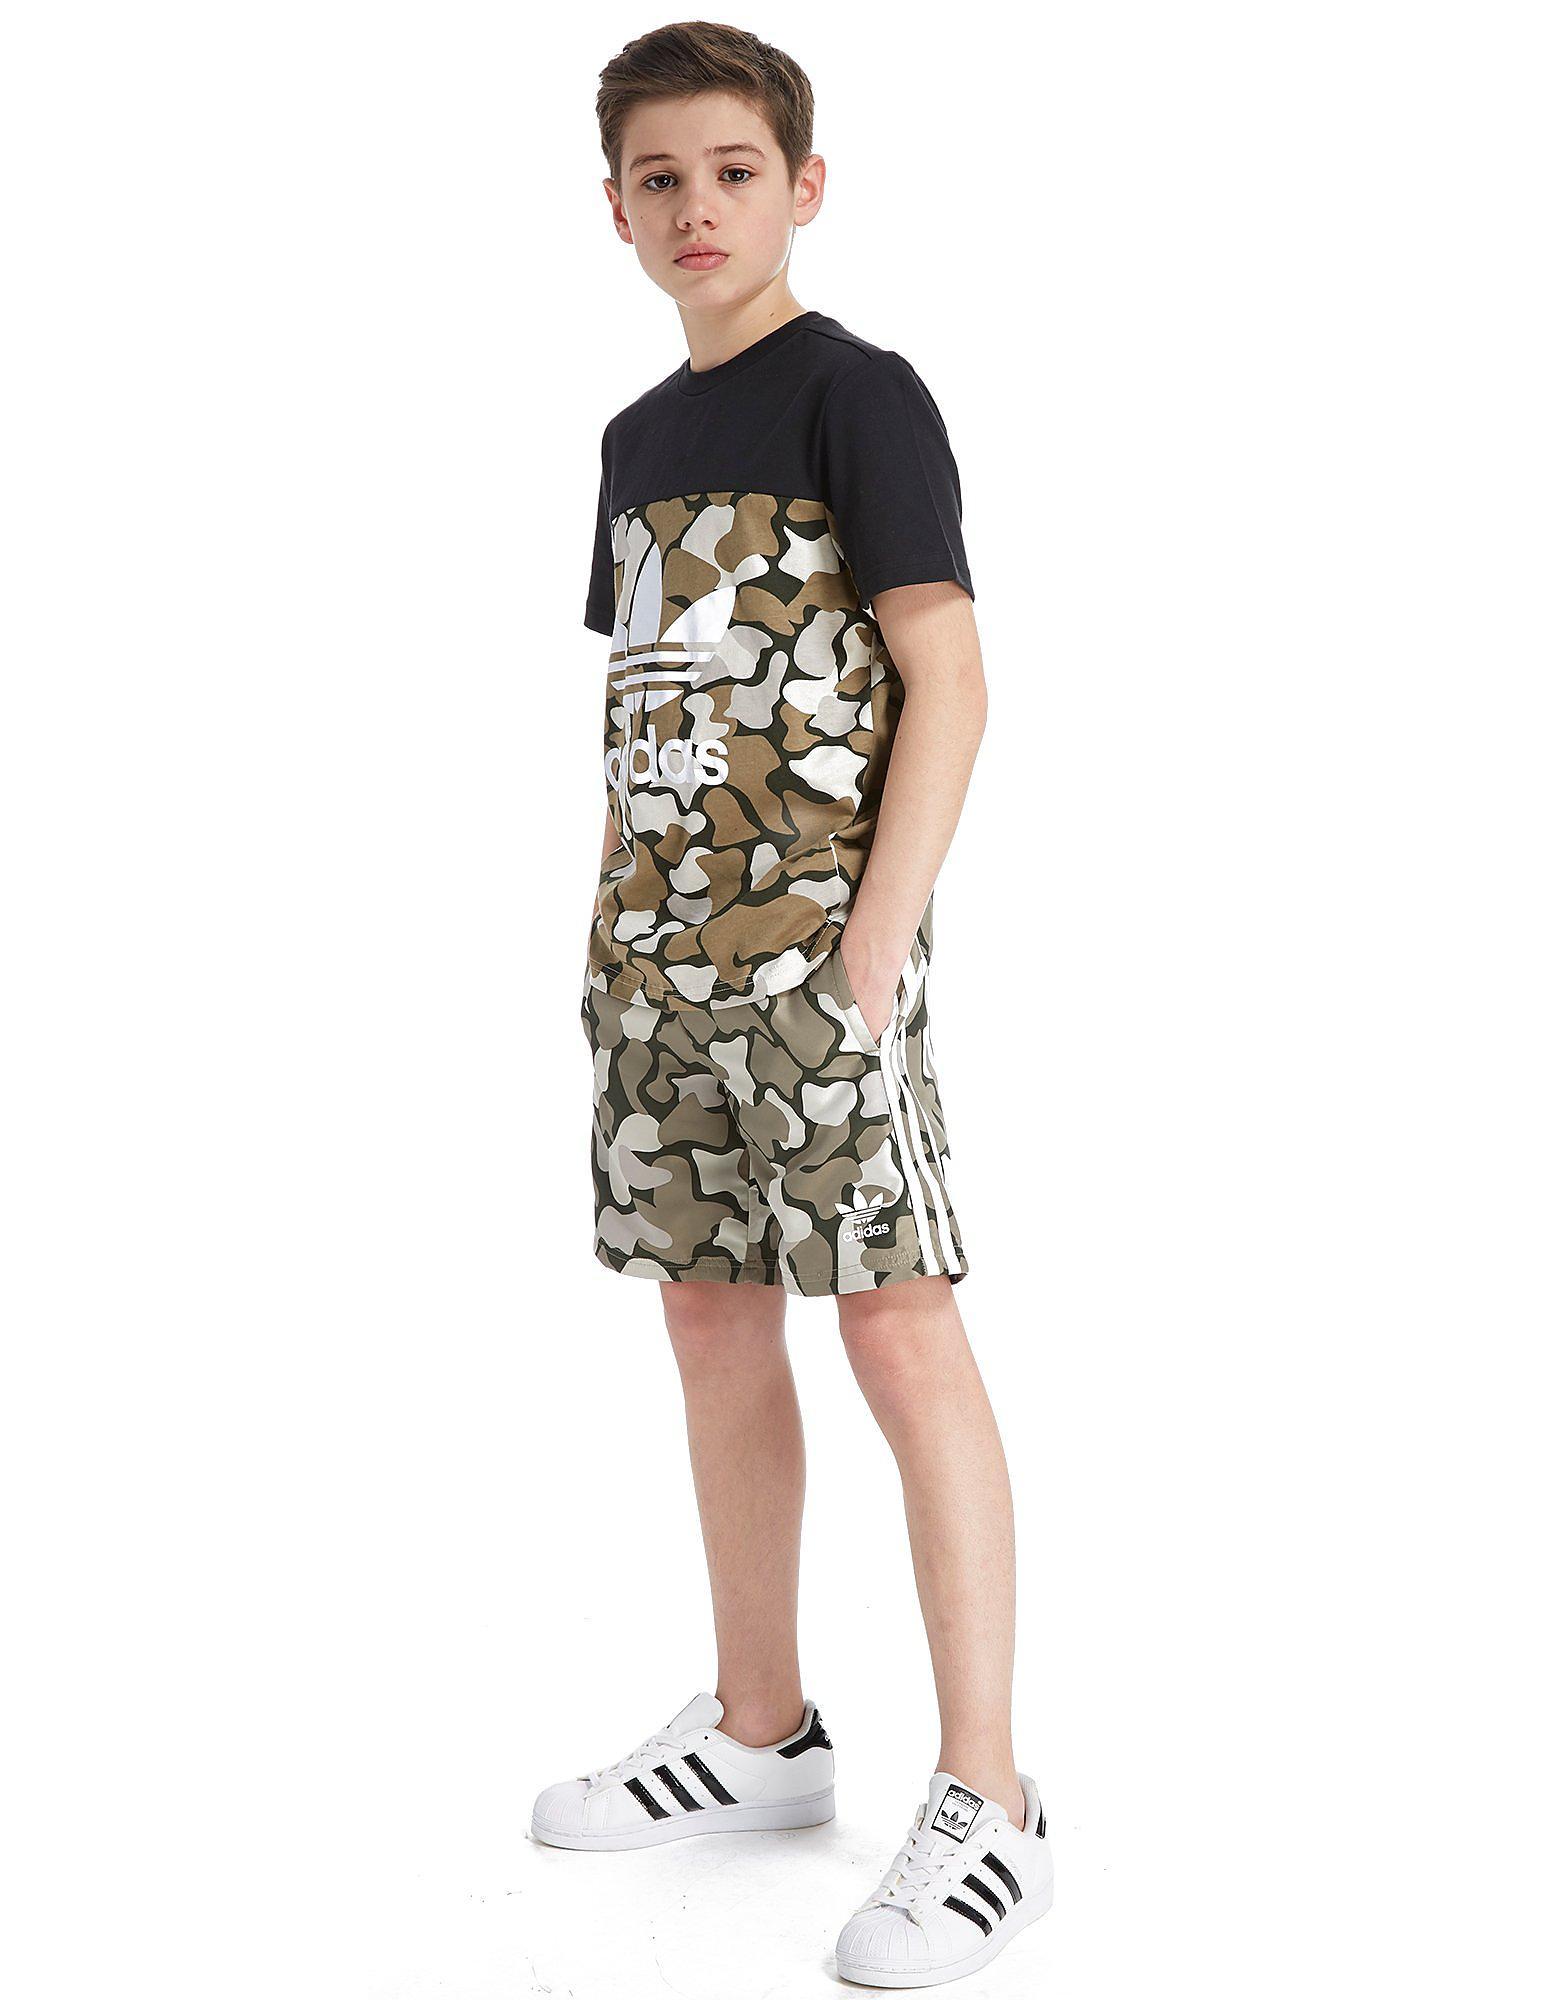 adidas Originals Trefoil Camo Swim Shorts Junior